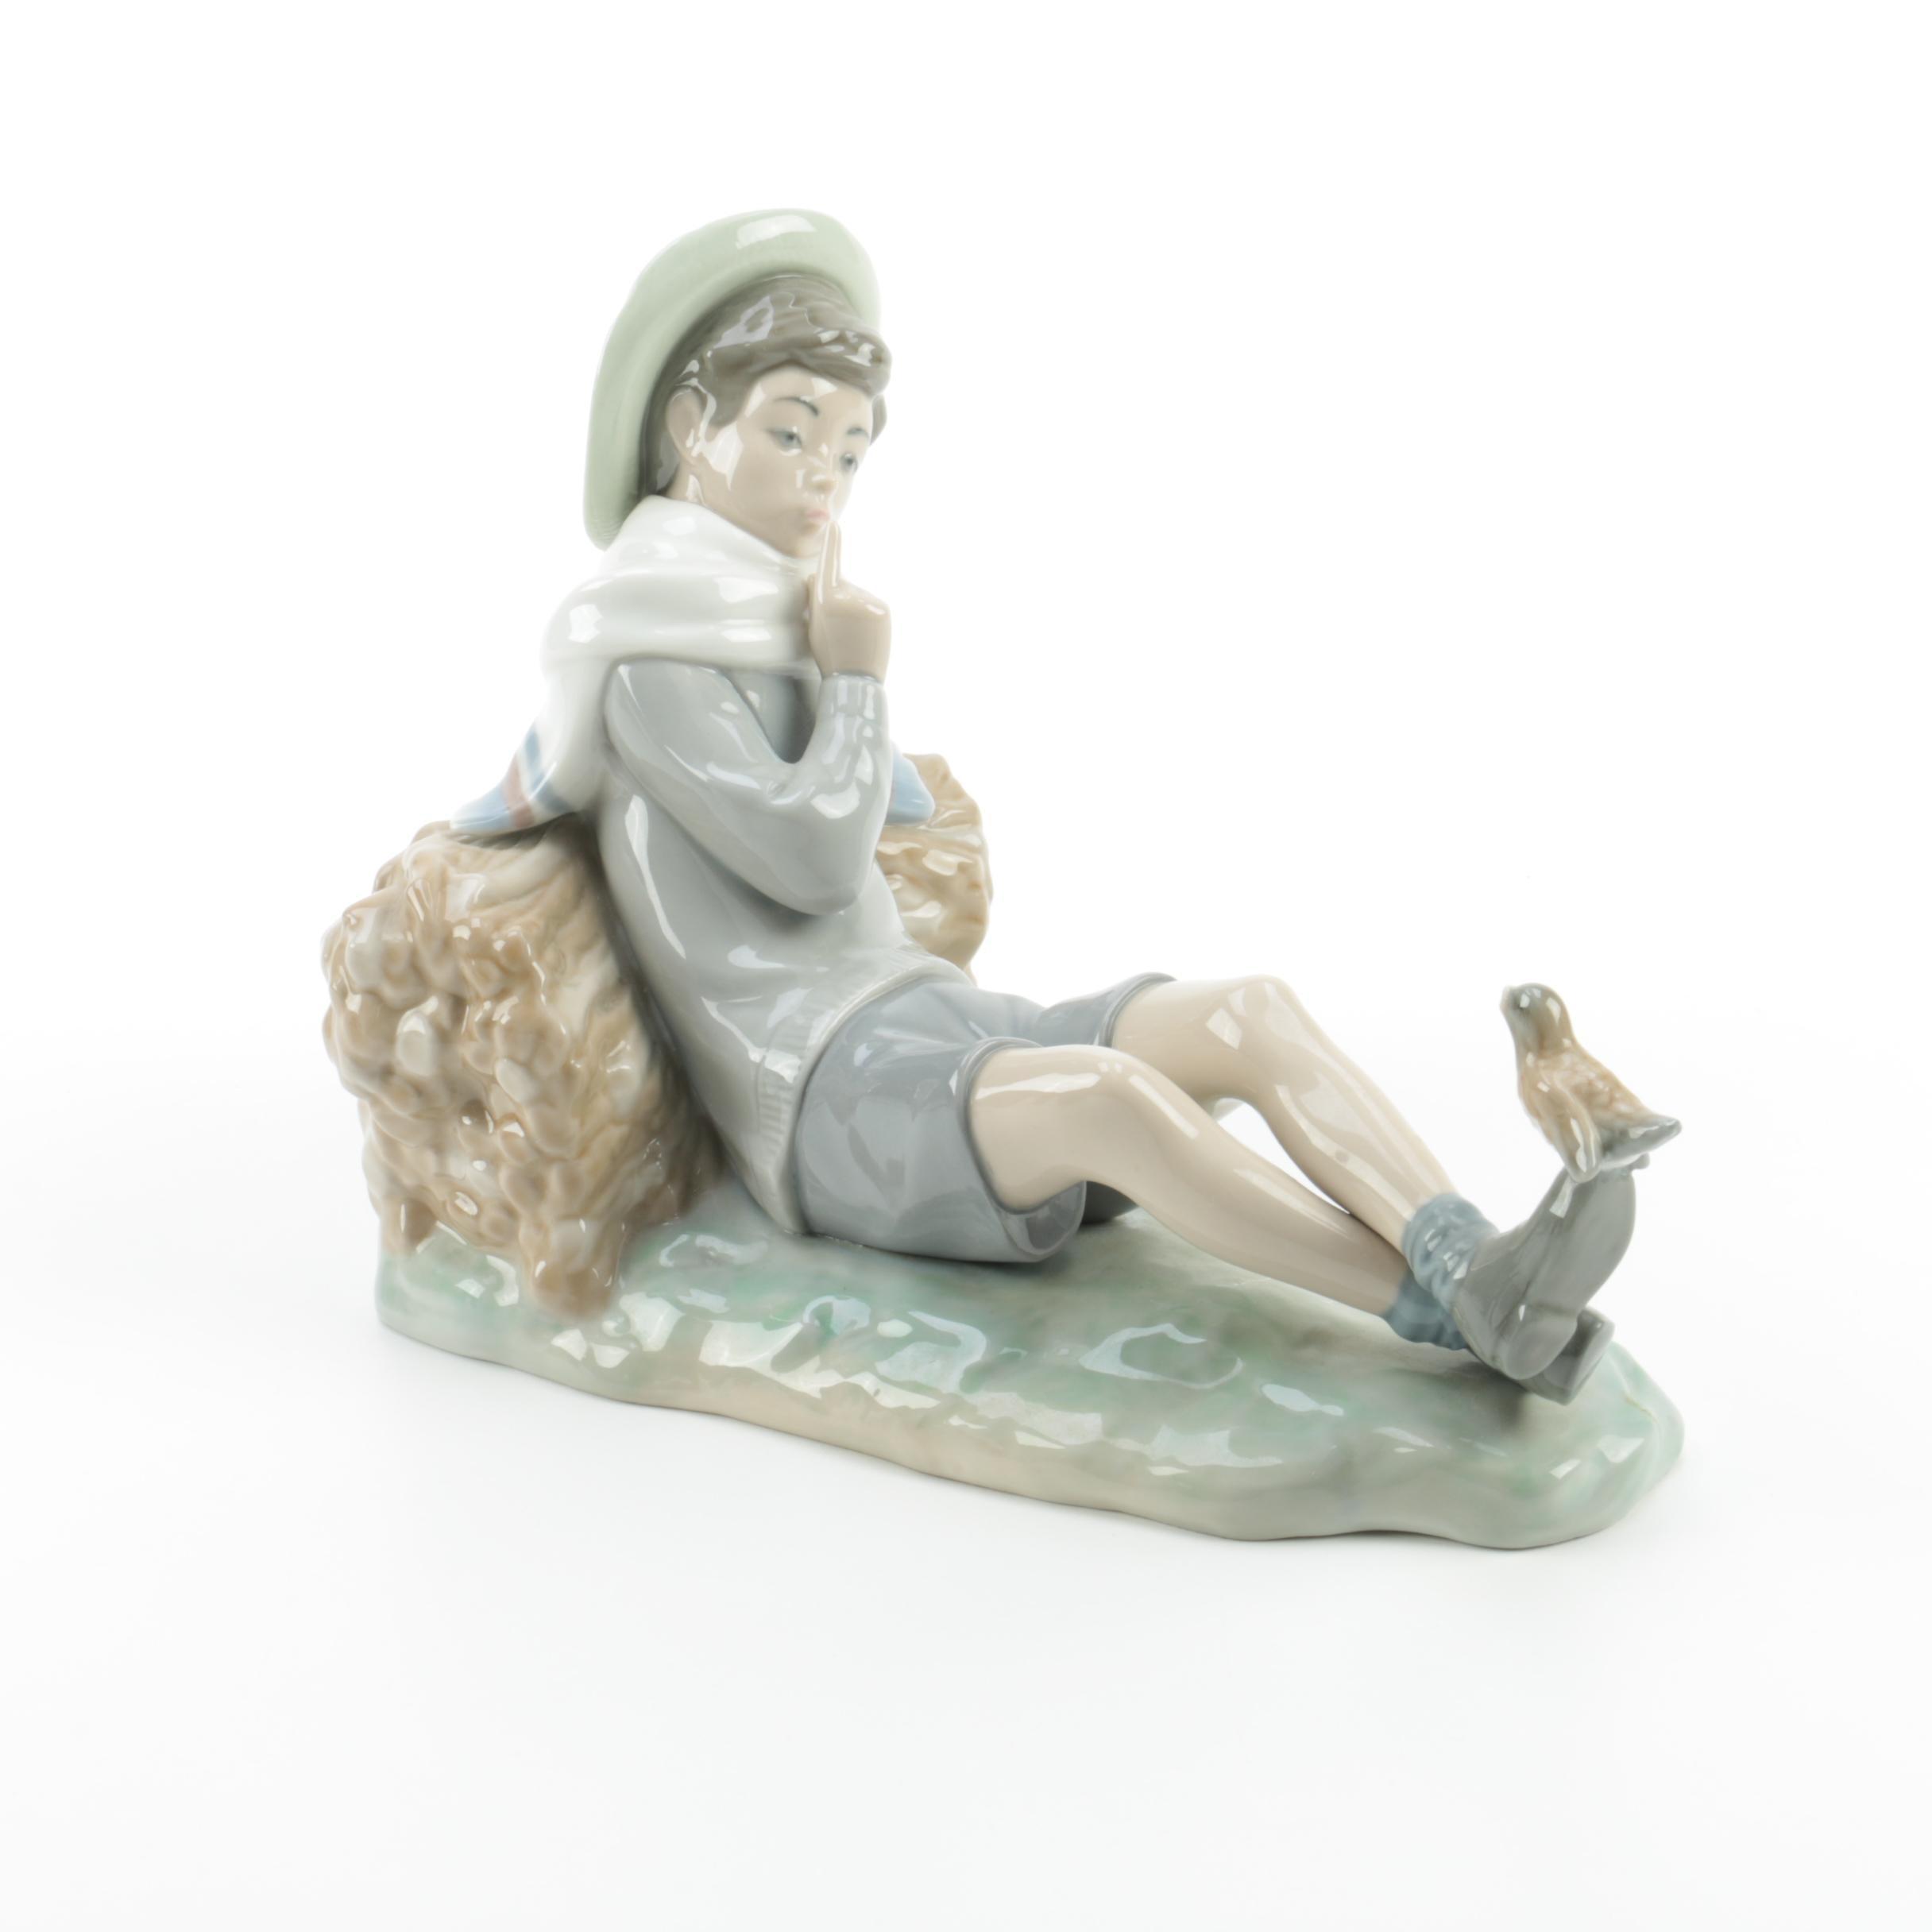 "Lladro ""Shepherd Boy with Bird"" Figurine"